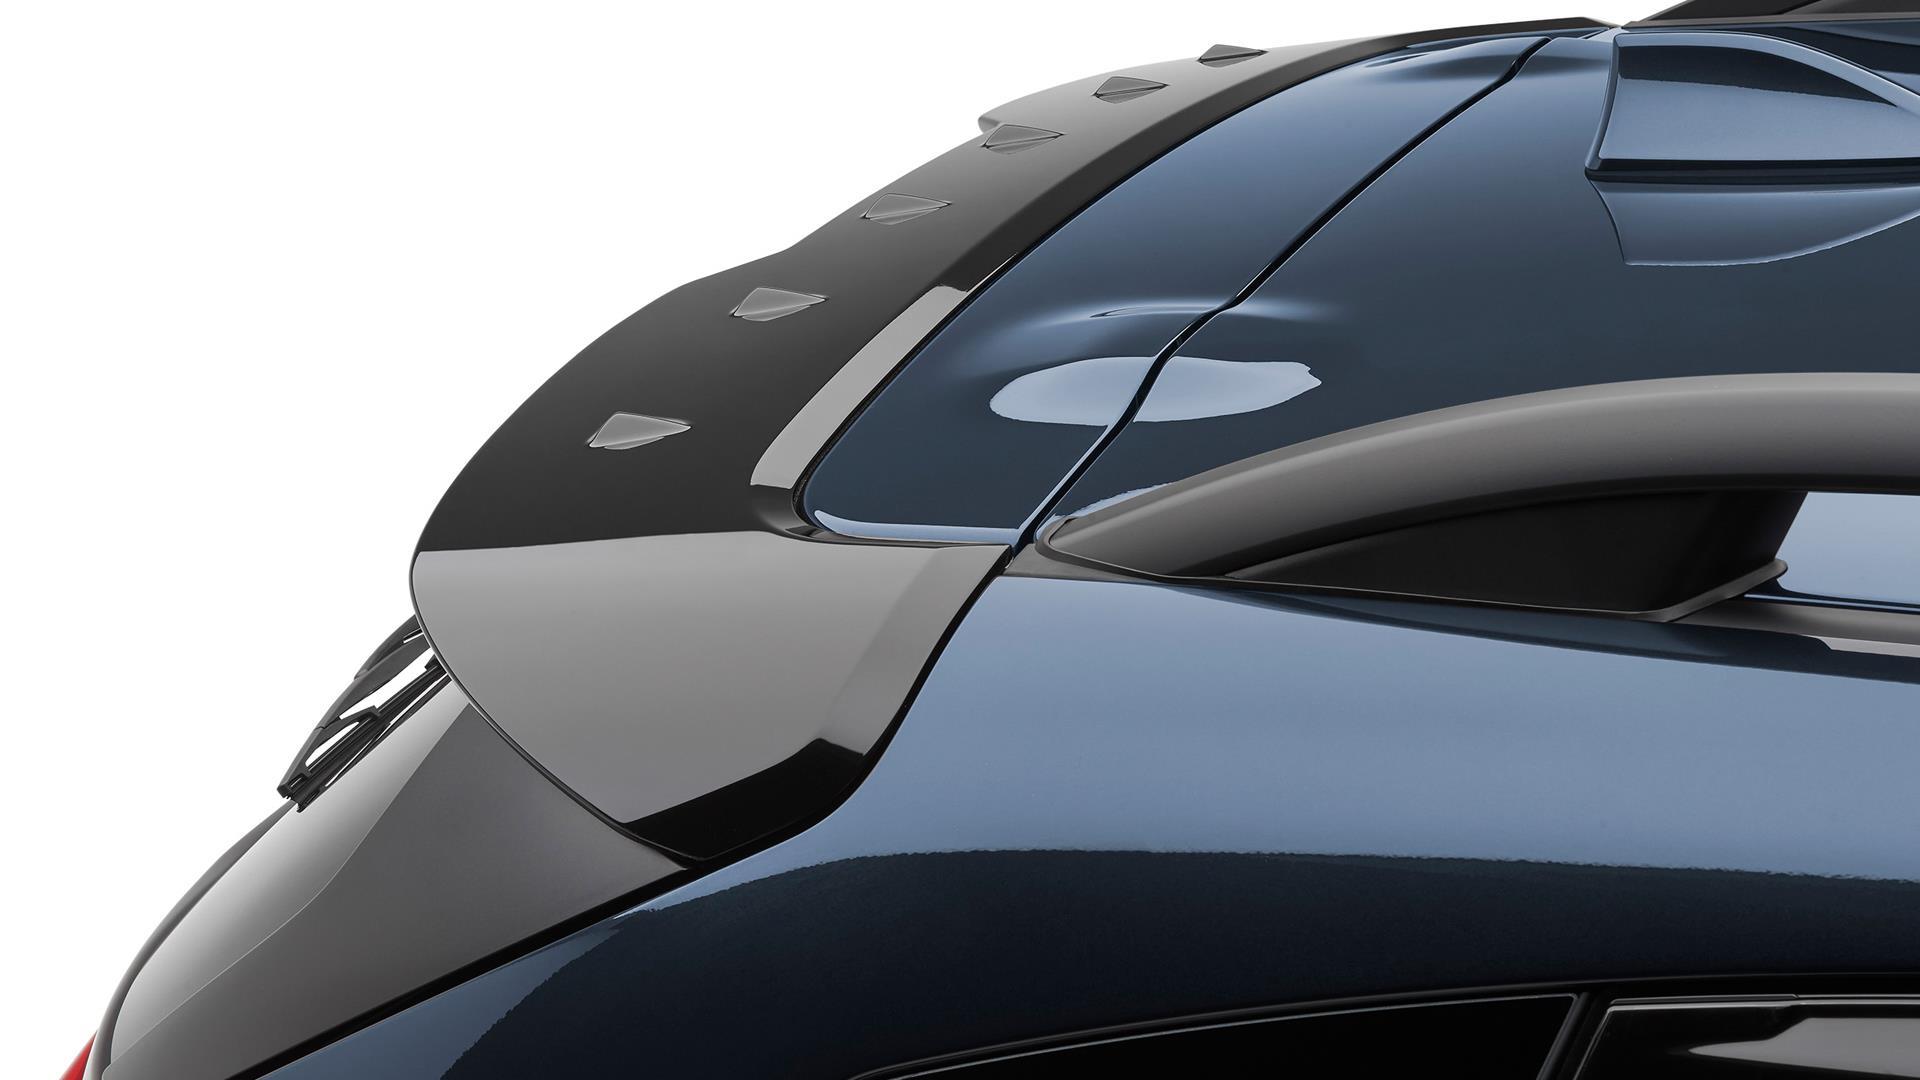 Subaru Crosstrek Sti Roof Spoiler E7210fl100 Kirby